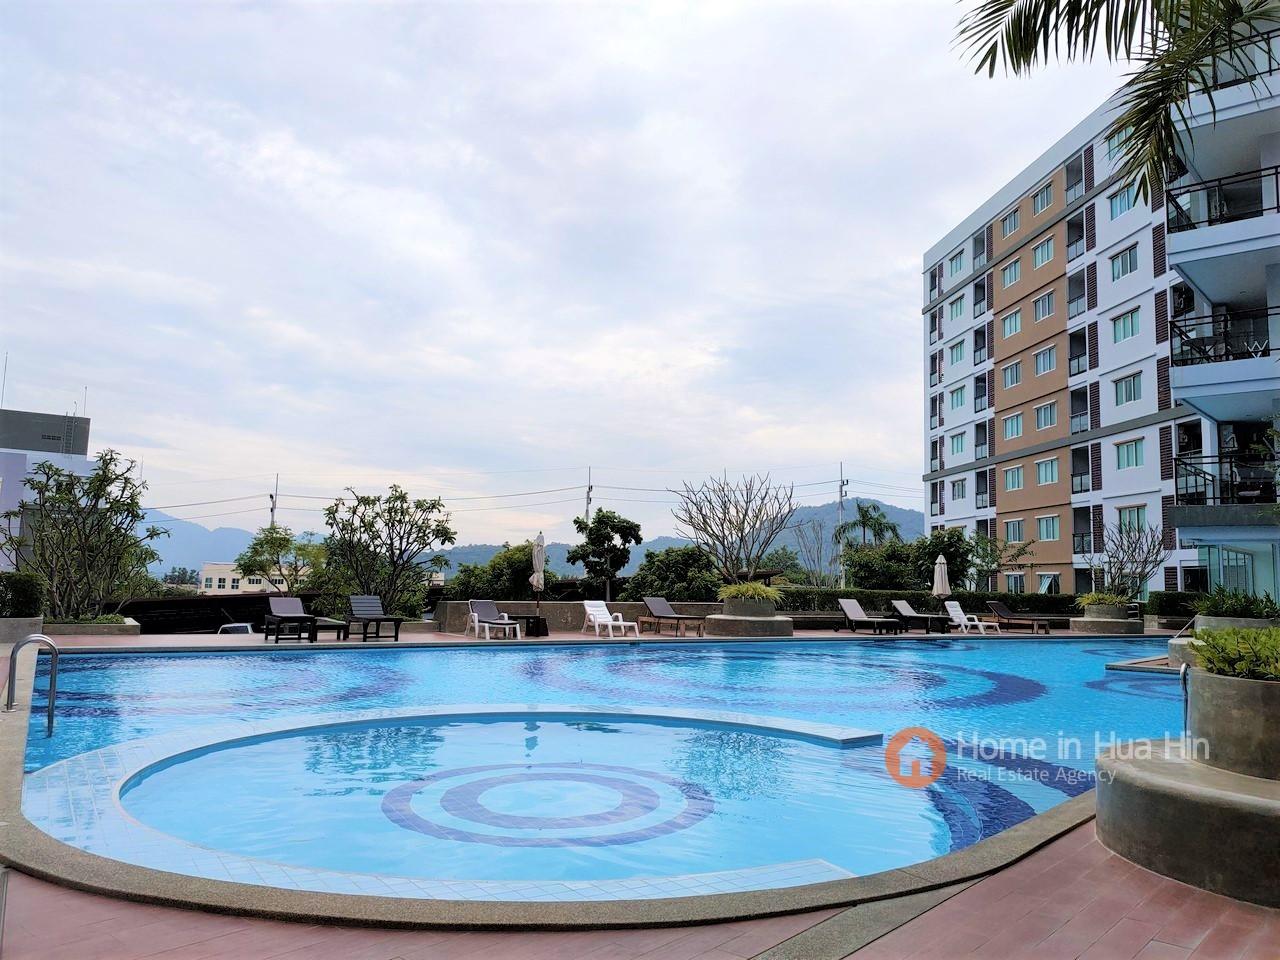 3 Bedroom Hua Hin Condo Apartment for SALE